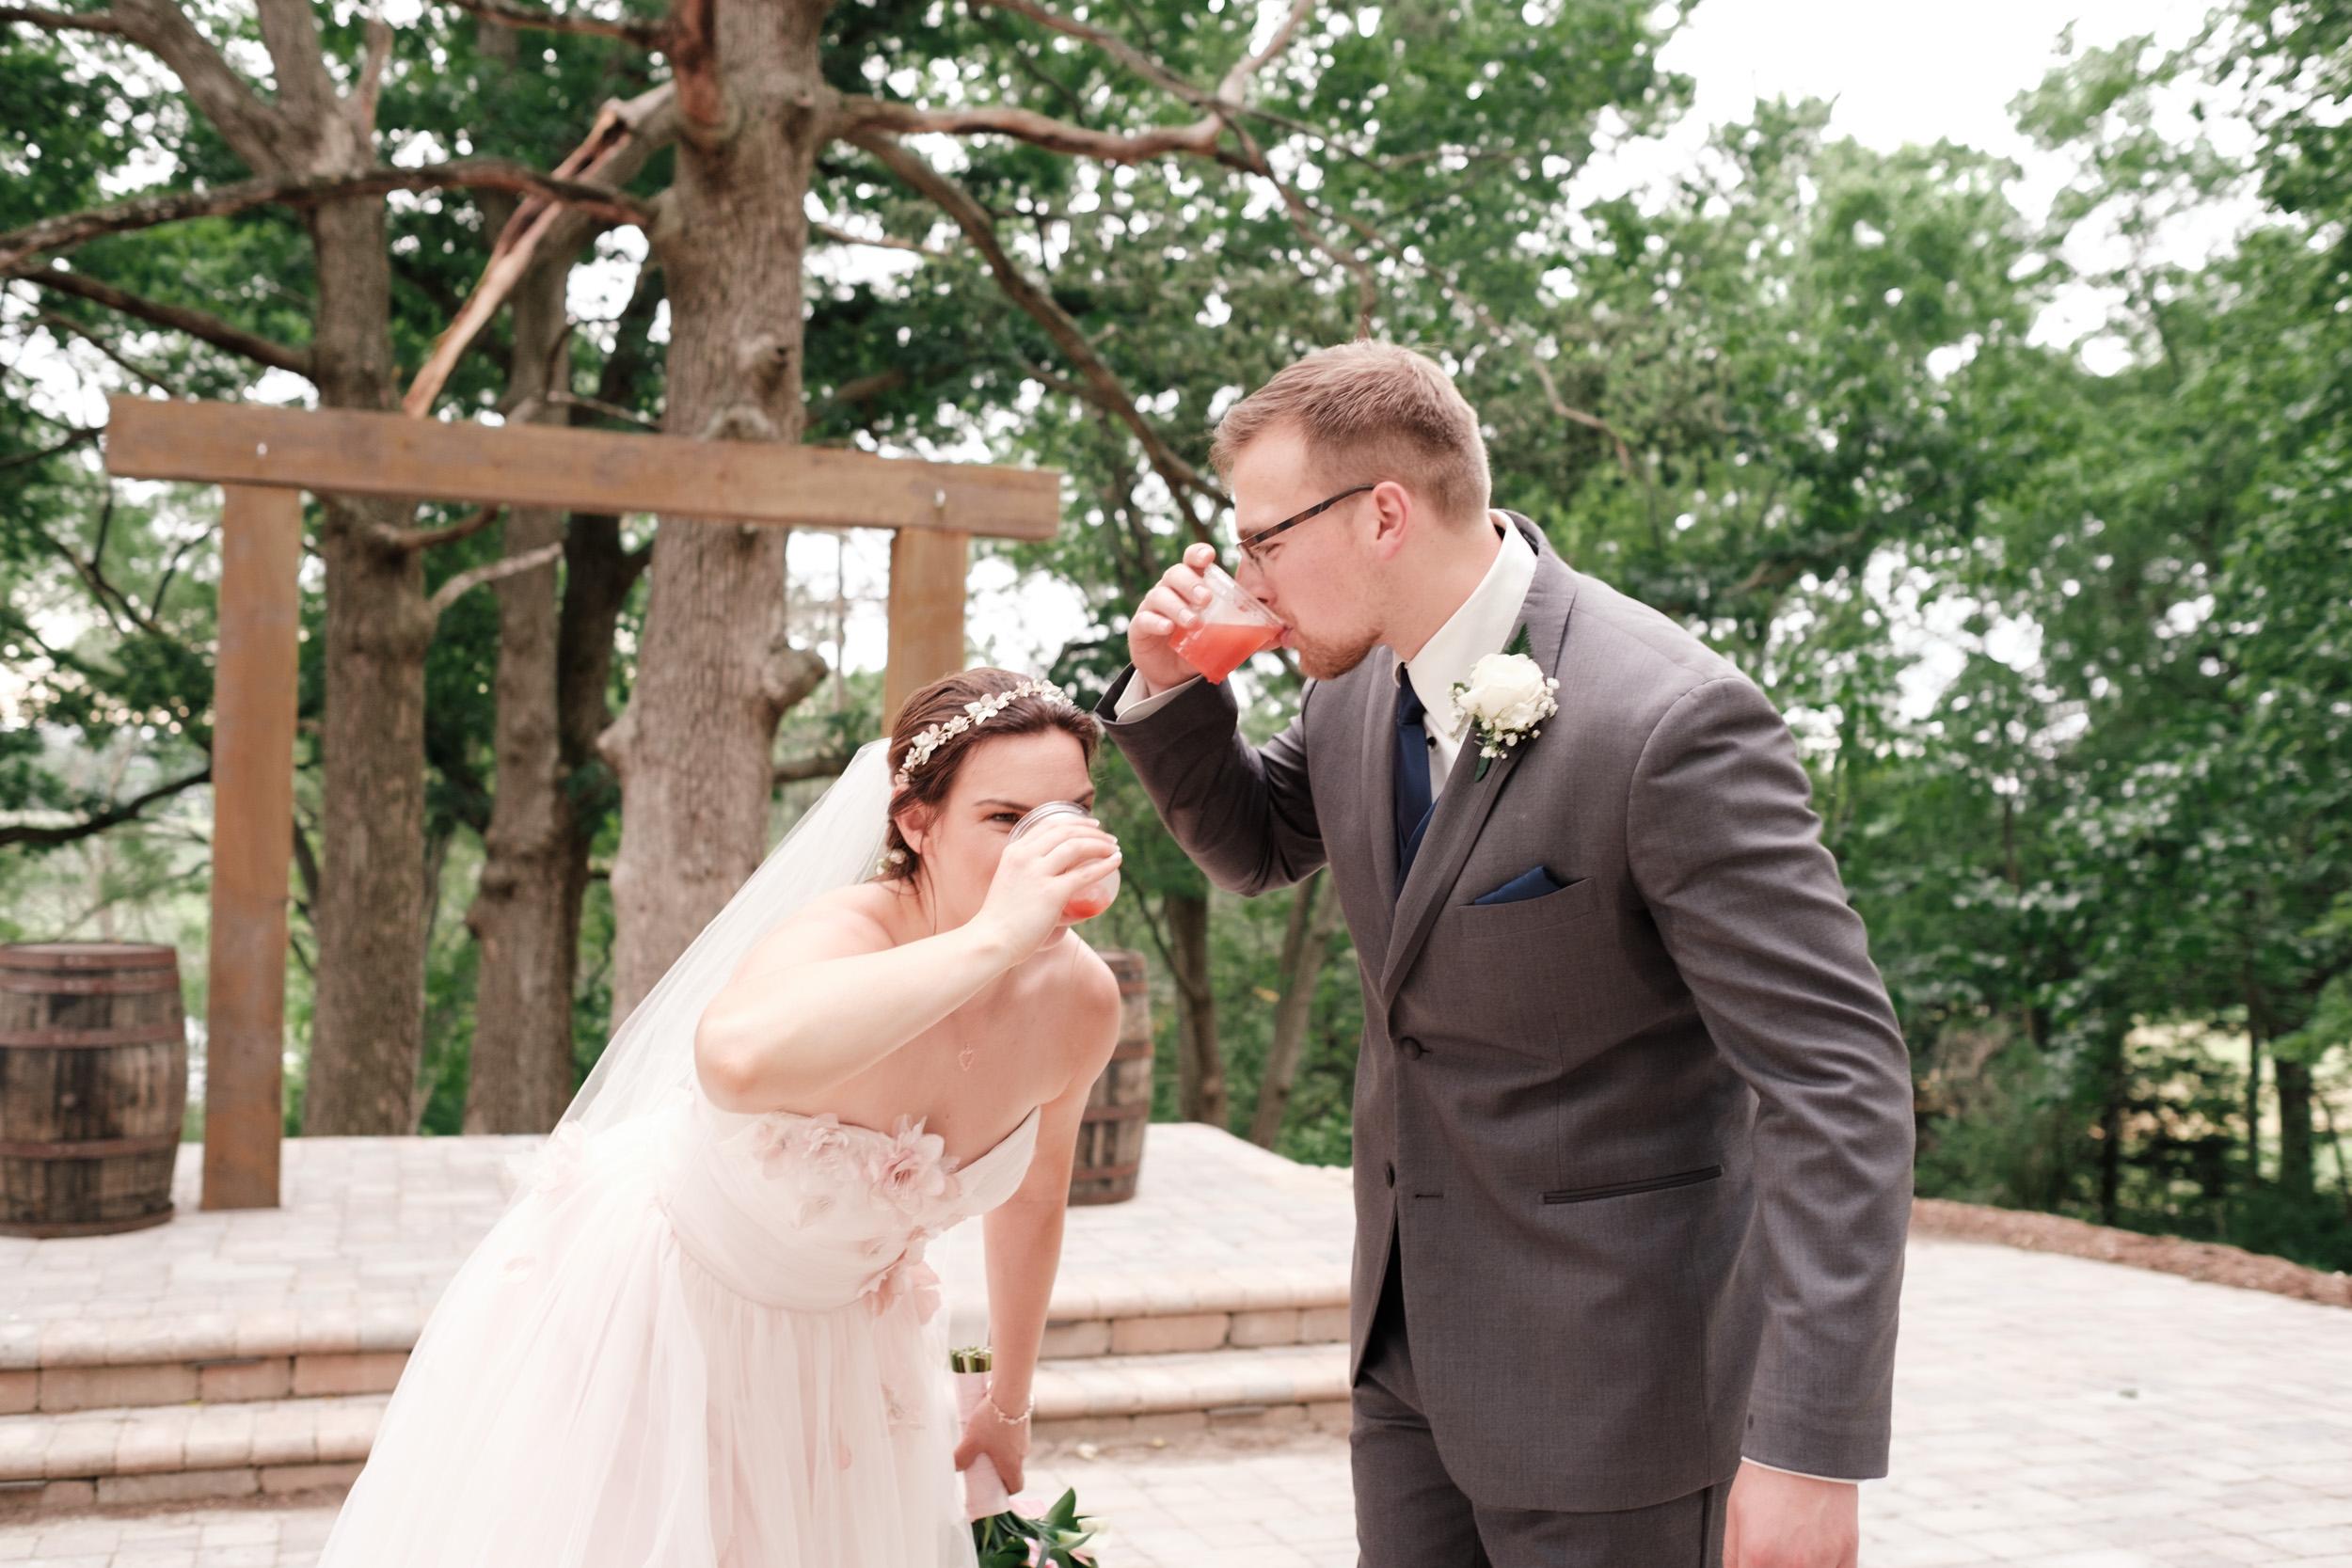 19-06-22-Ryan-Katie-The-Fields-Reserve-Wedding-48.jpg